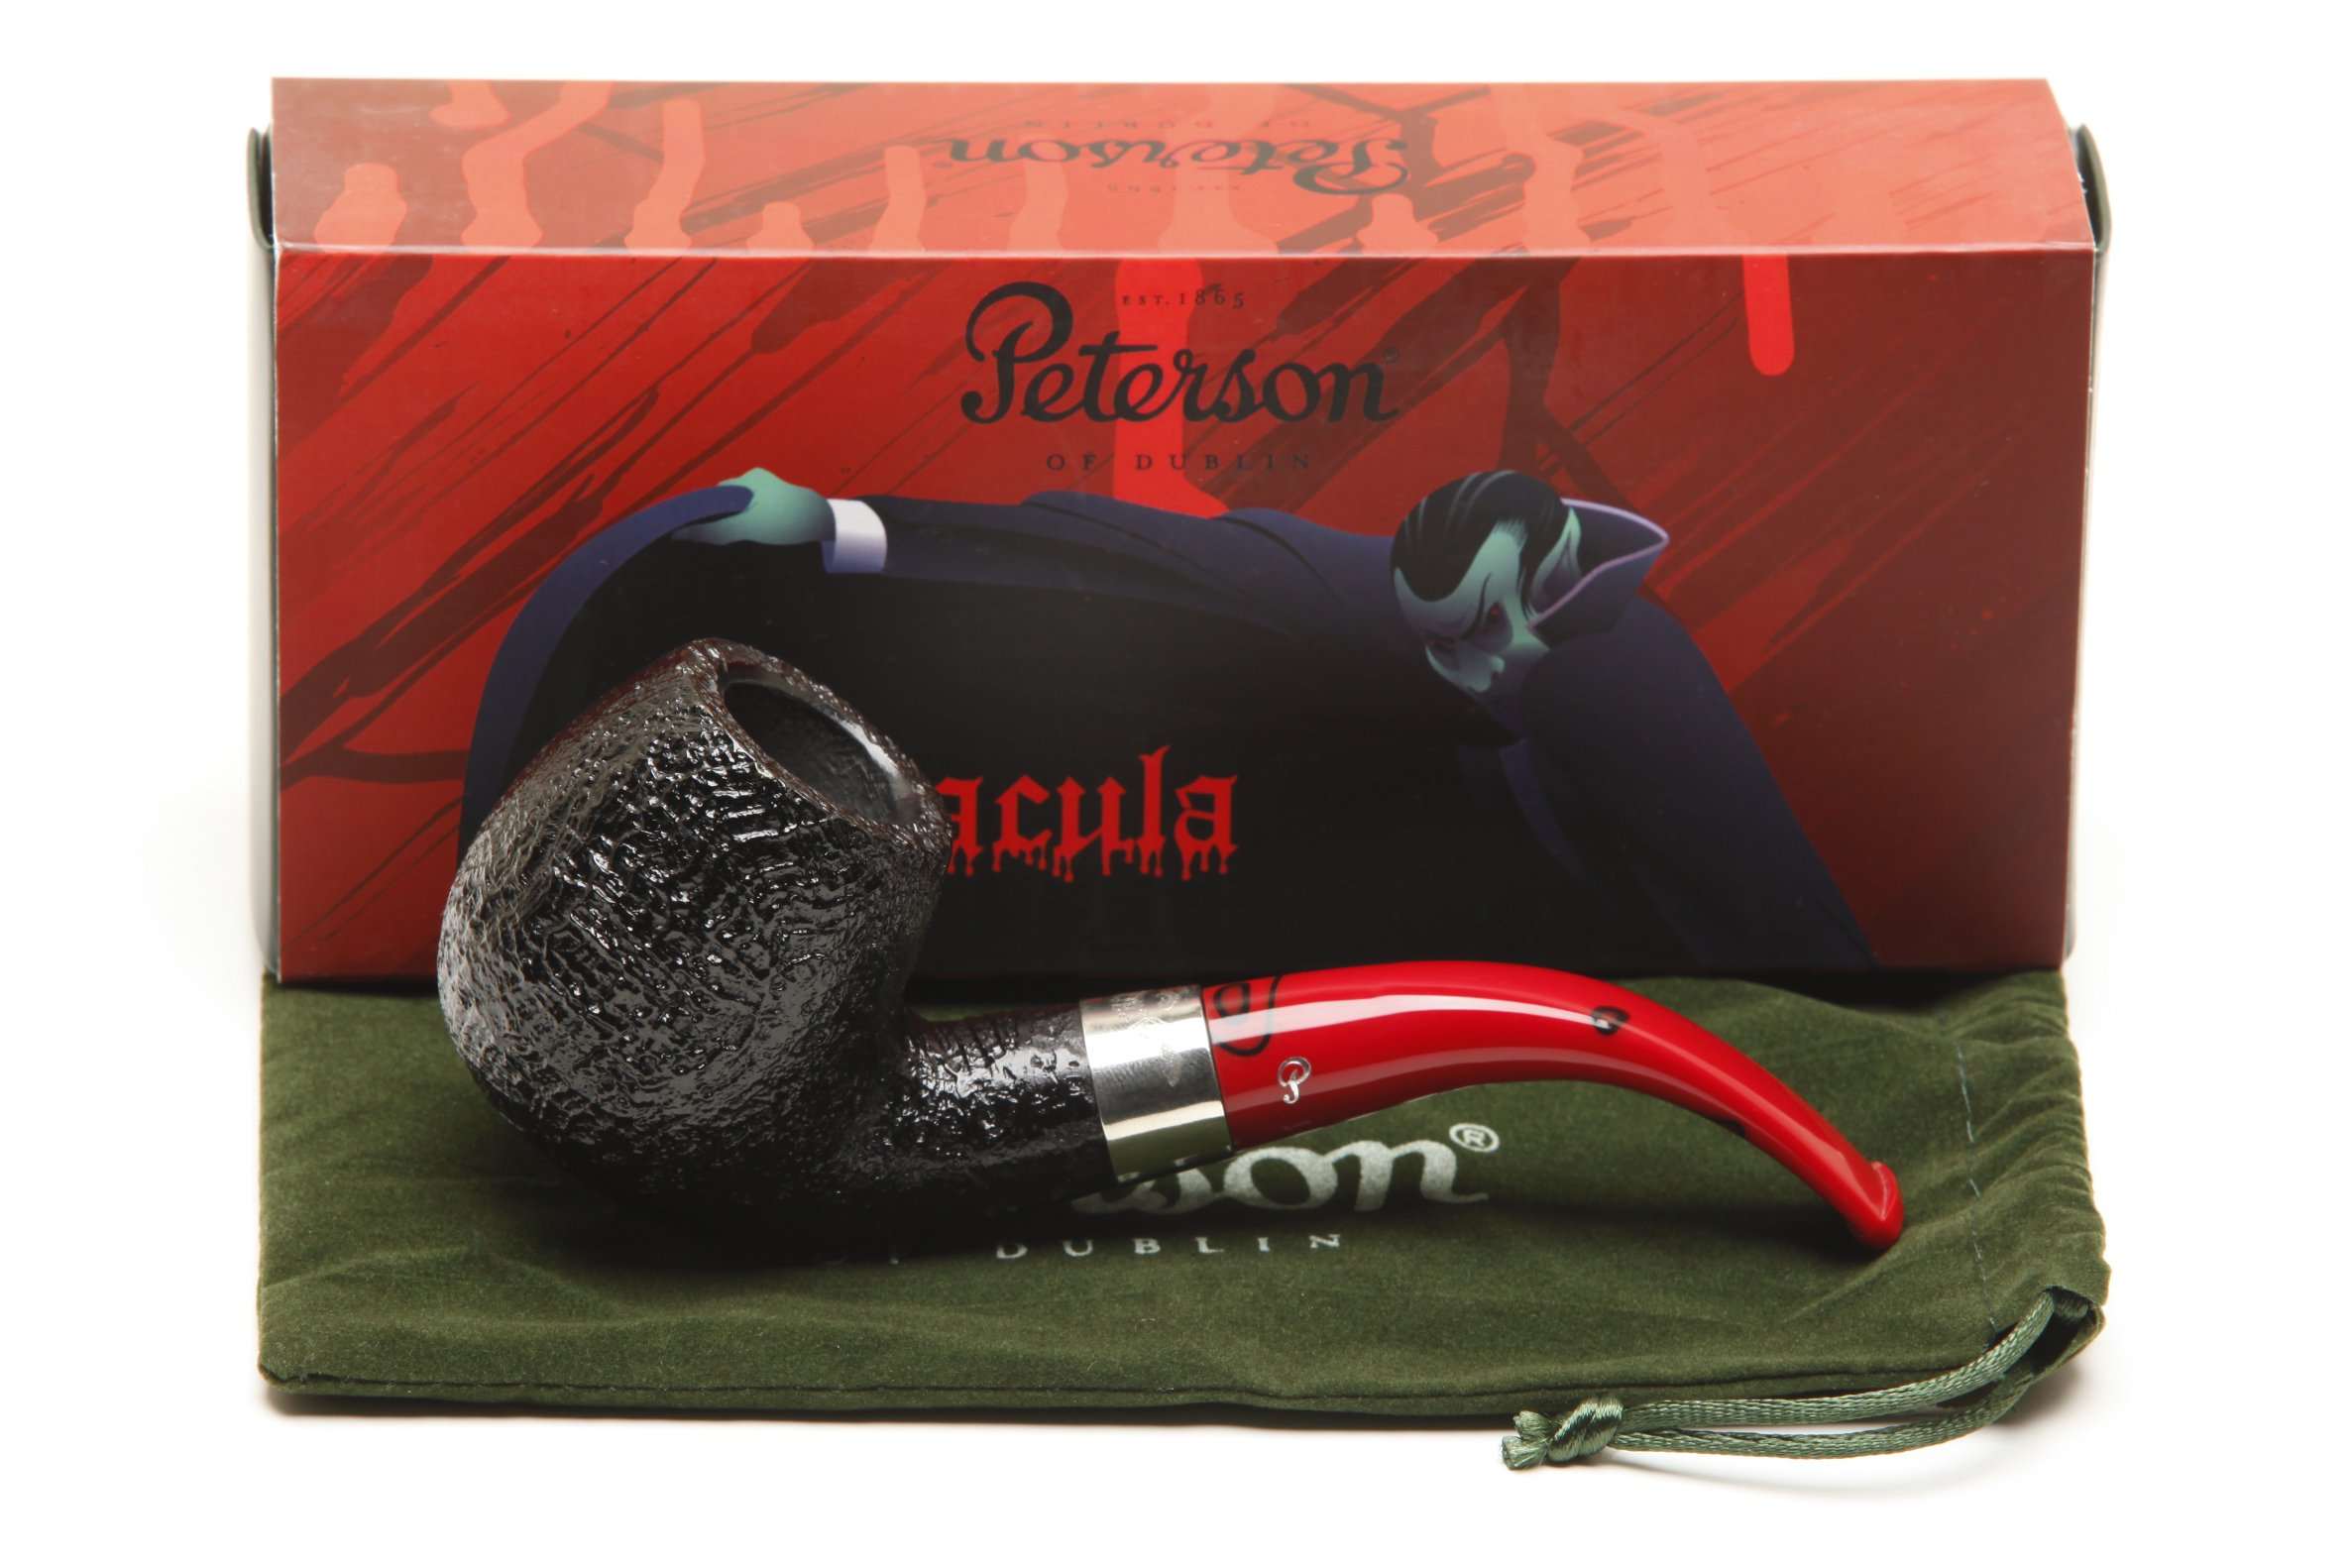 Peterson Dracula 68 Sandblast Fishtail Tobacco Pipe